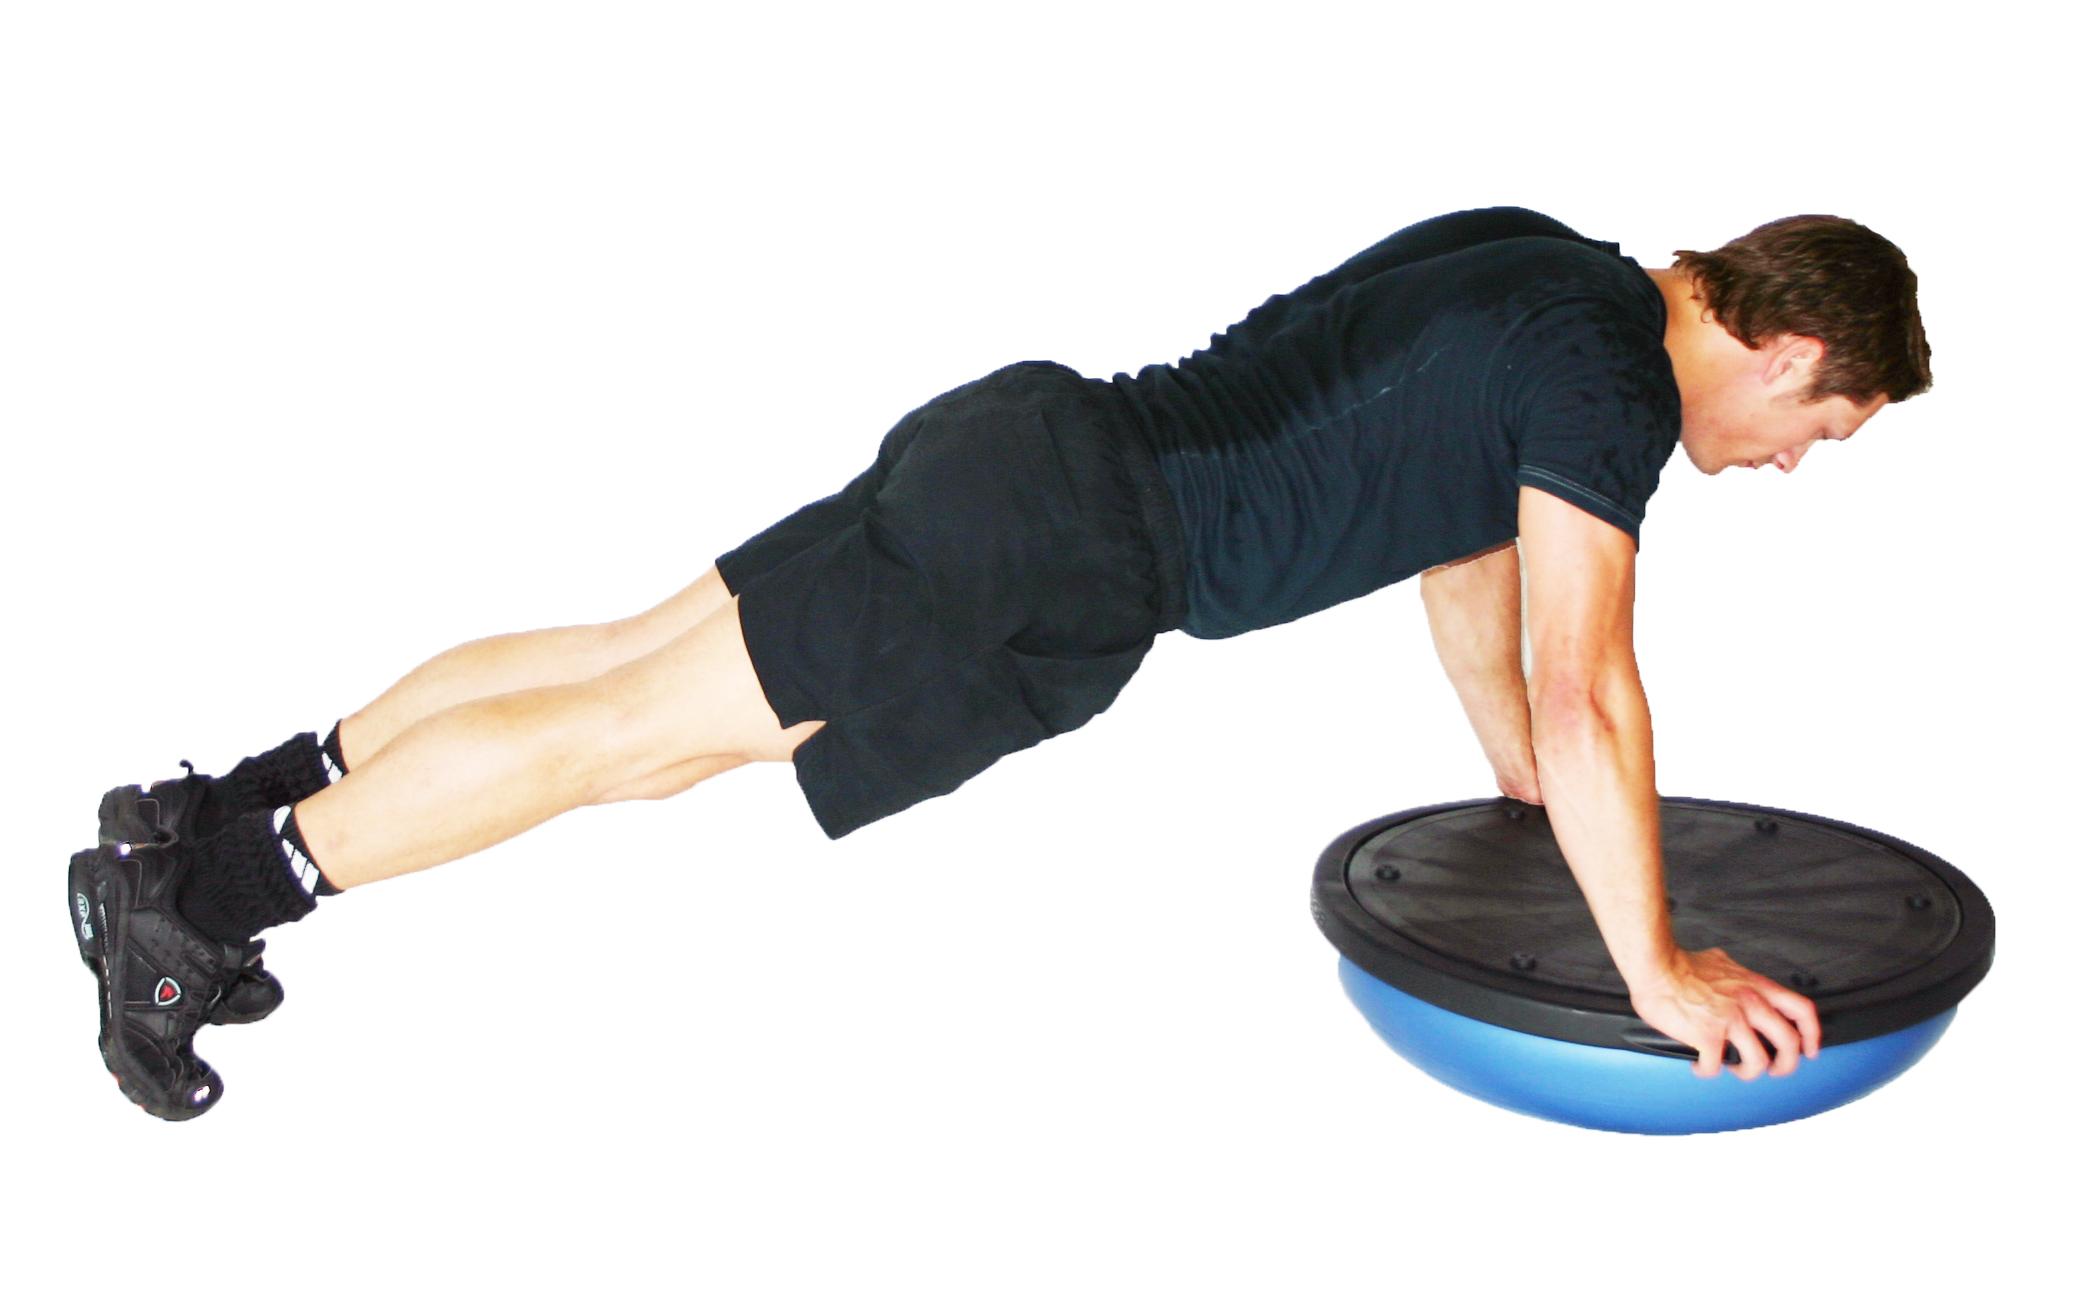 BOth Sides Up træning push up